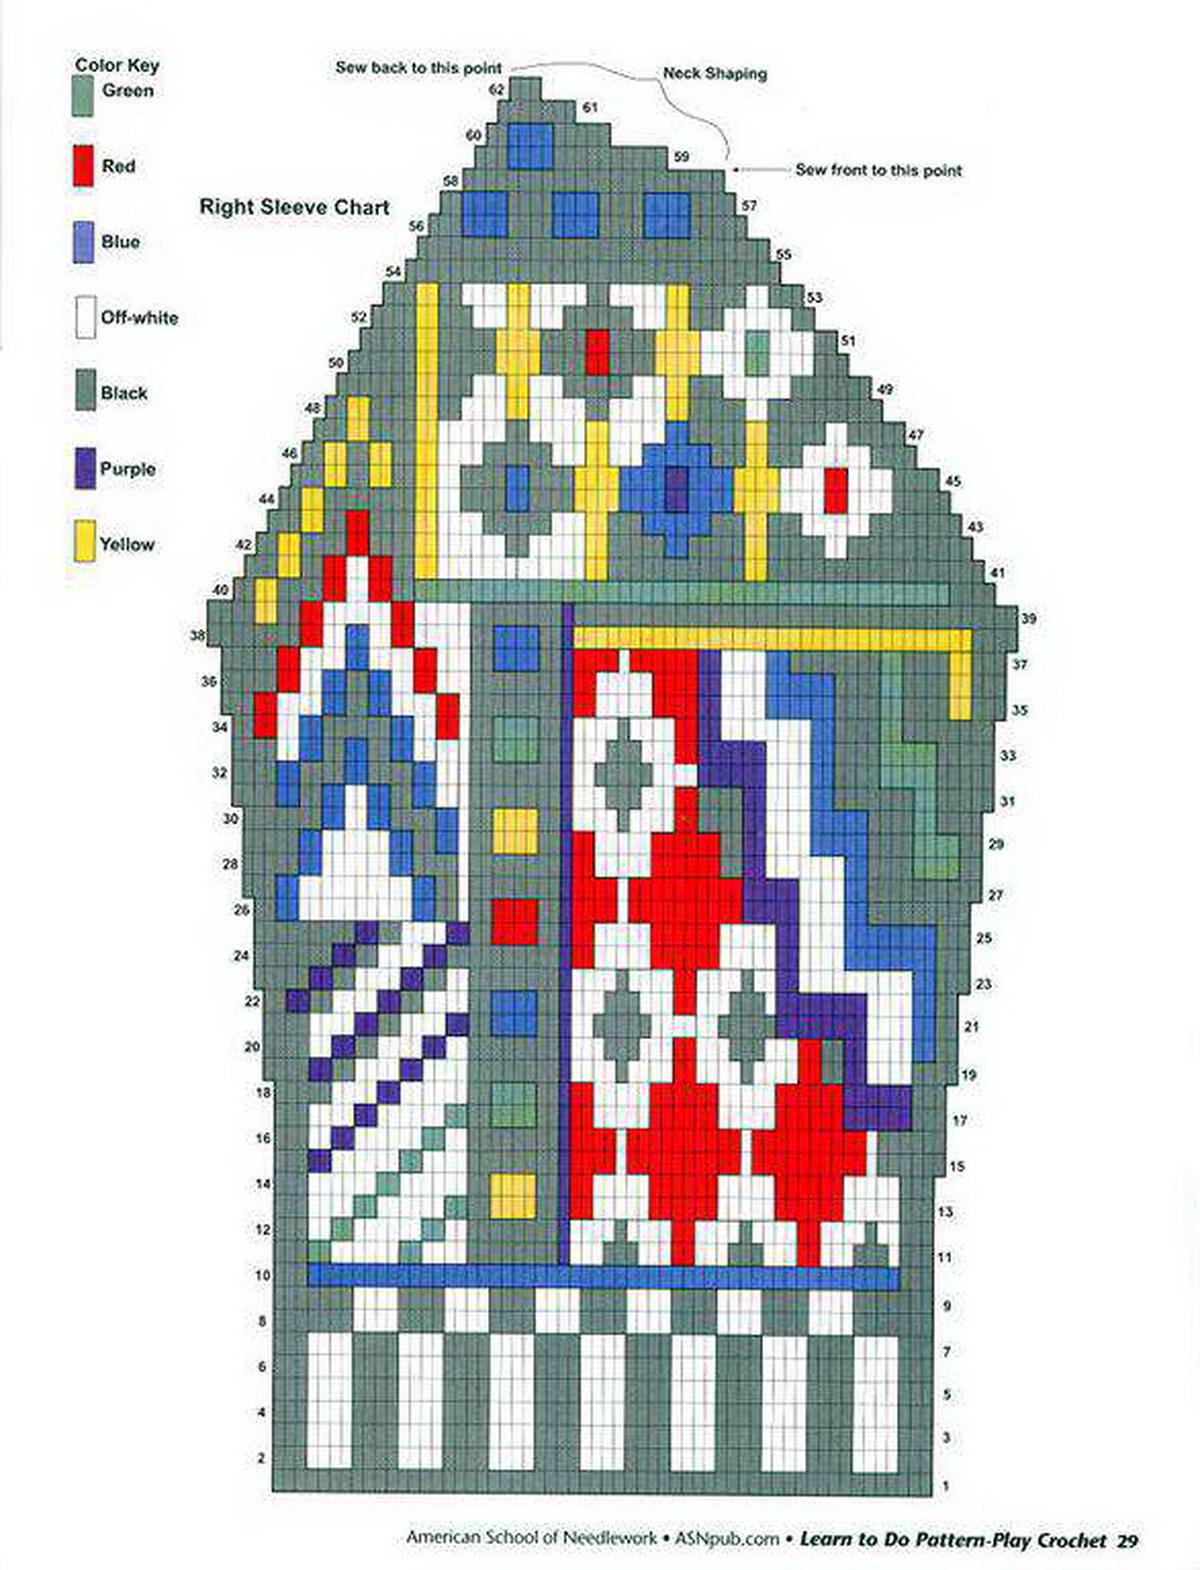 0245_Learn to do pattern-play crochet (7)